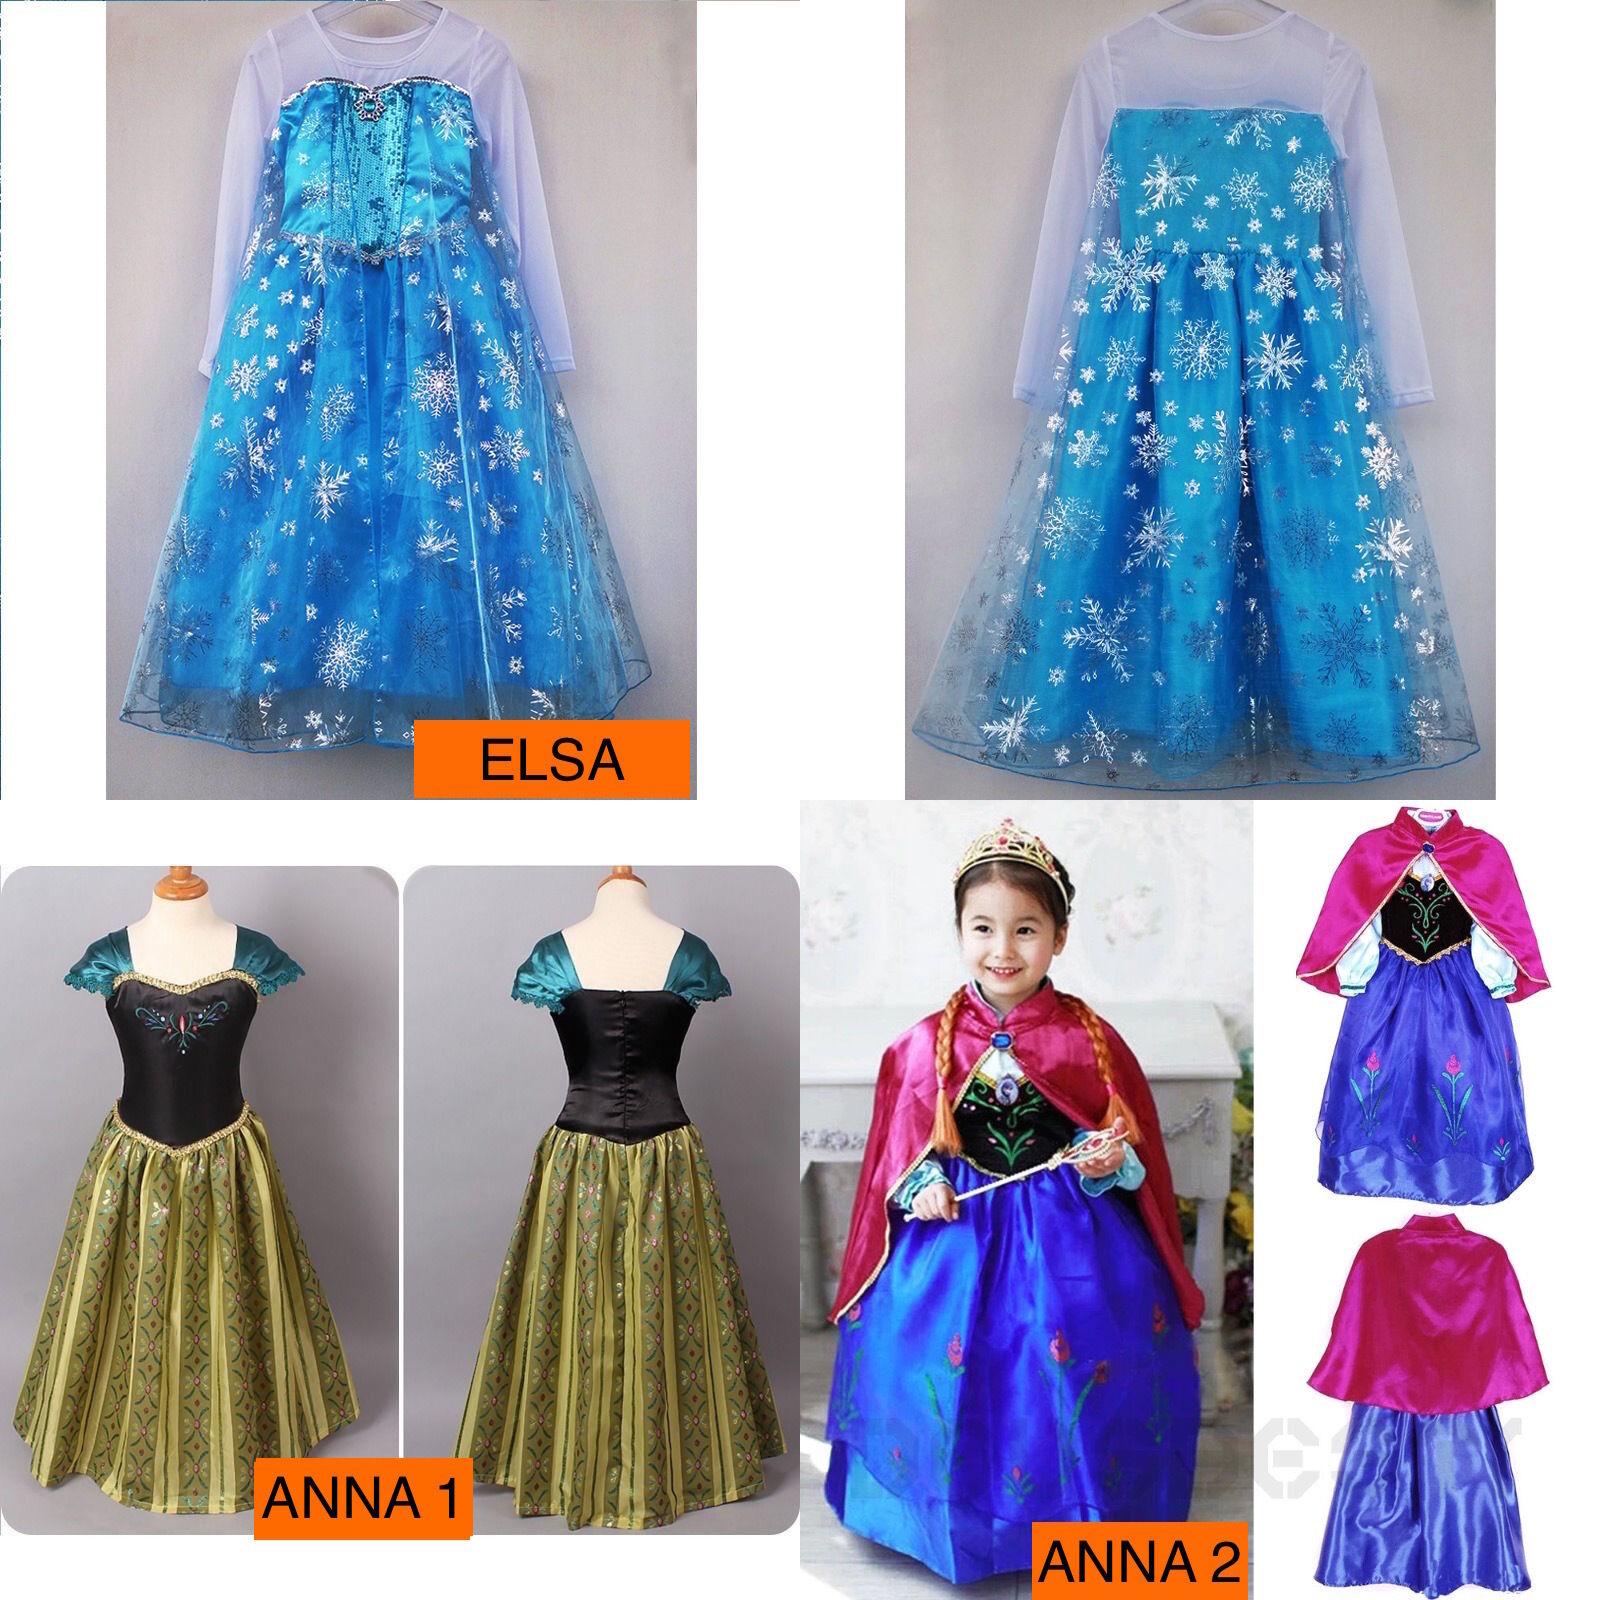 Principessa Elsa Abito Costume Fantasia Anna+4piece Bambini Party Cosplay Natale